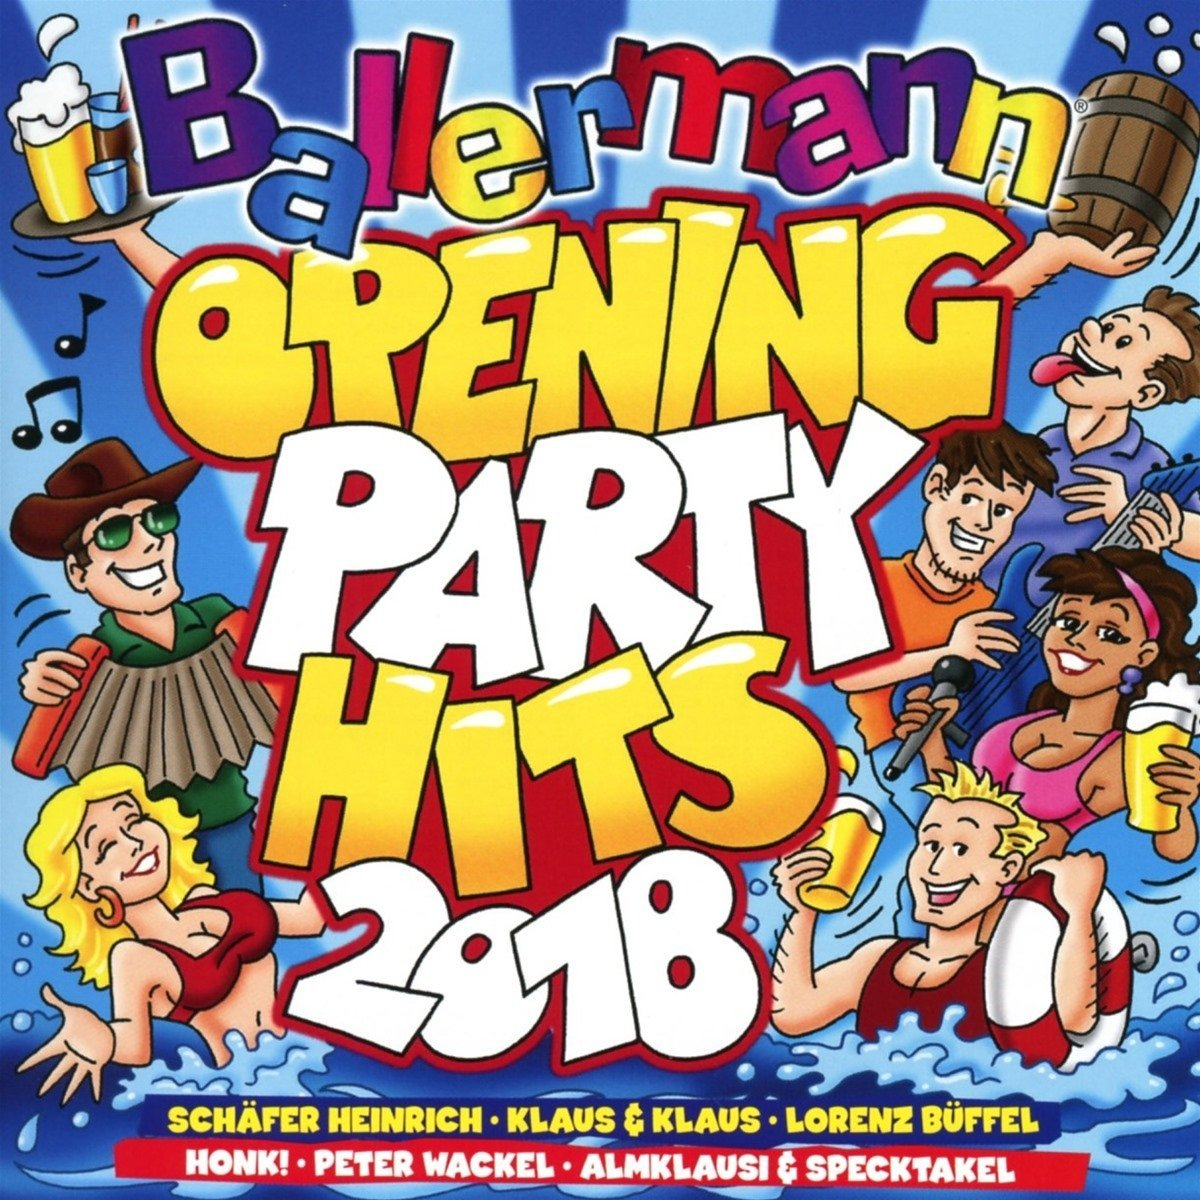 BALLERMANN OPENING PARTYHITS 2018